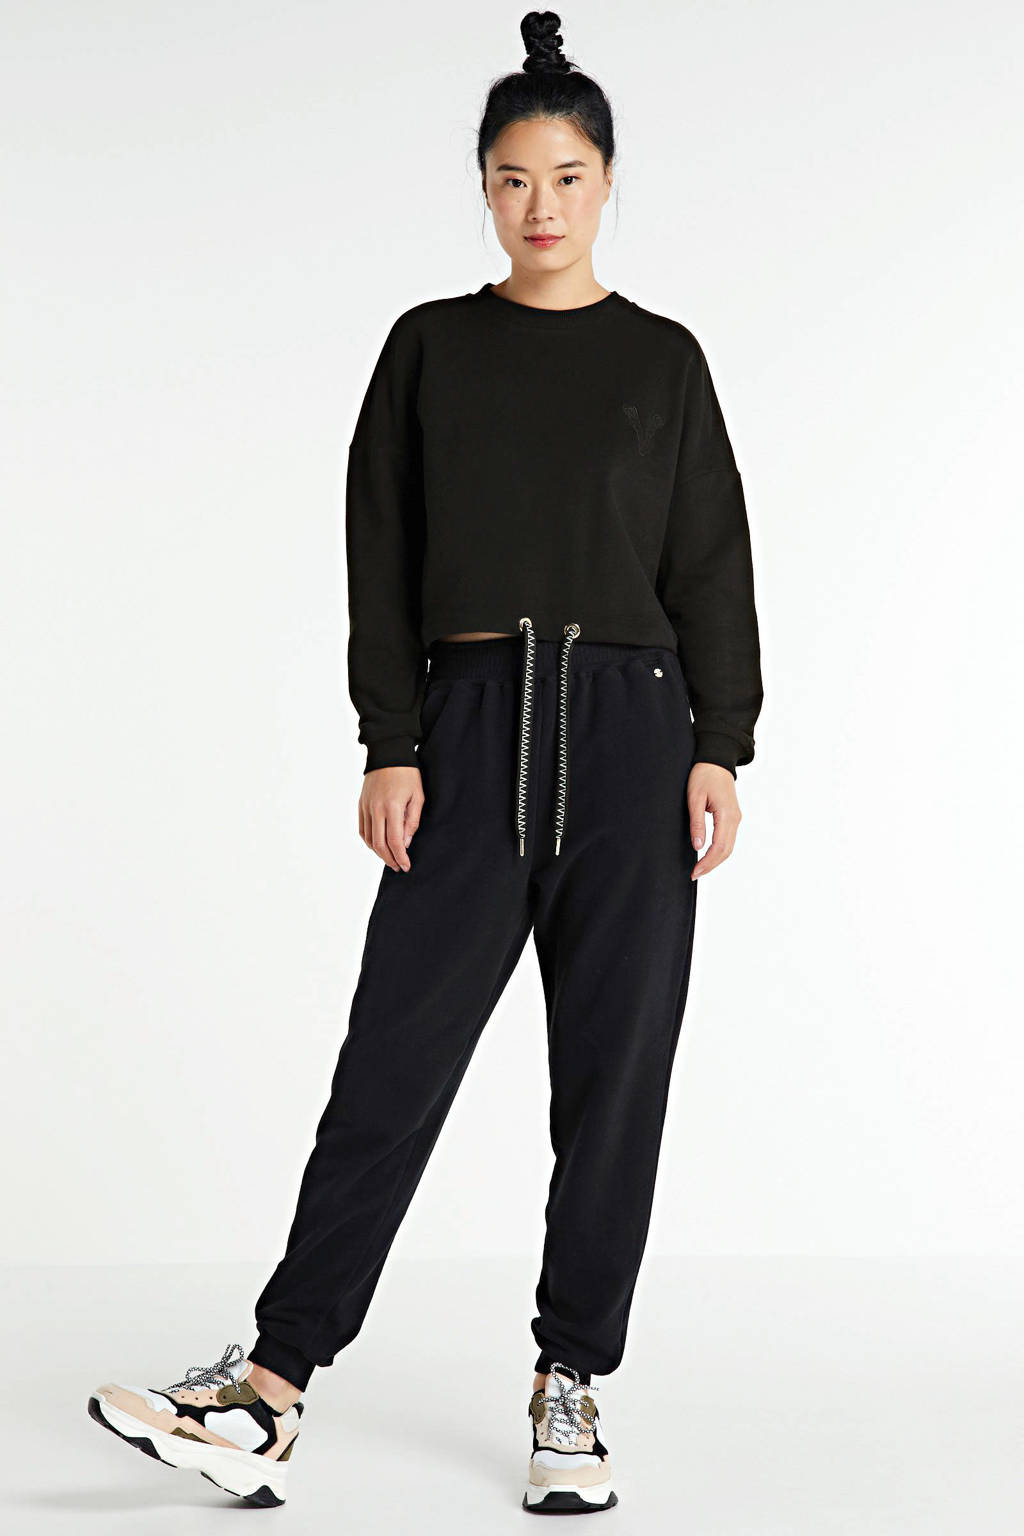 JOSH V high waist straight fit broek PHILI met borduursels zwart, Zwart